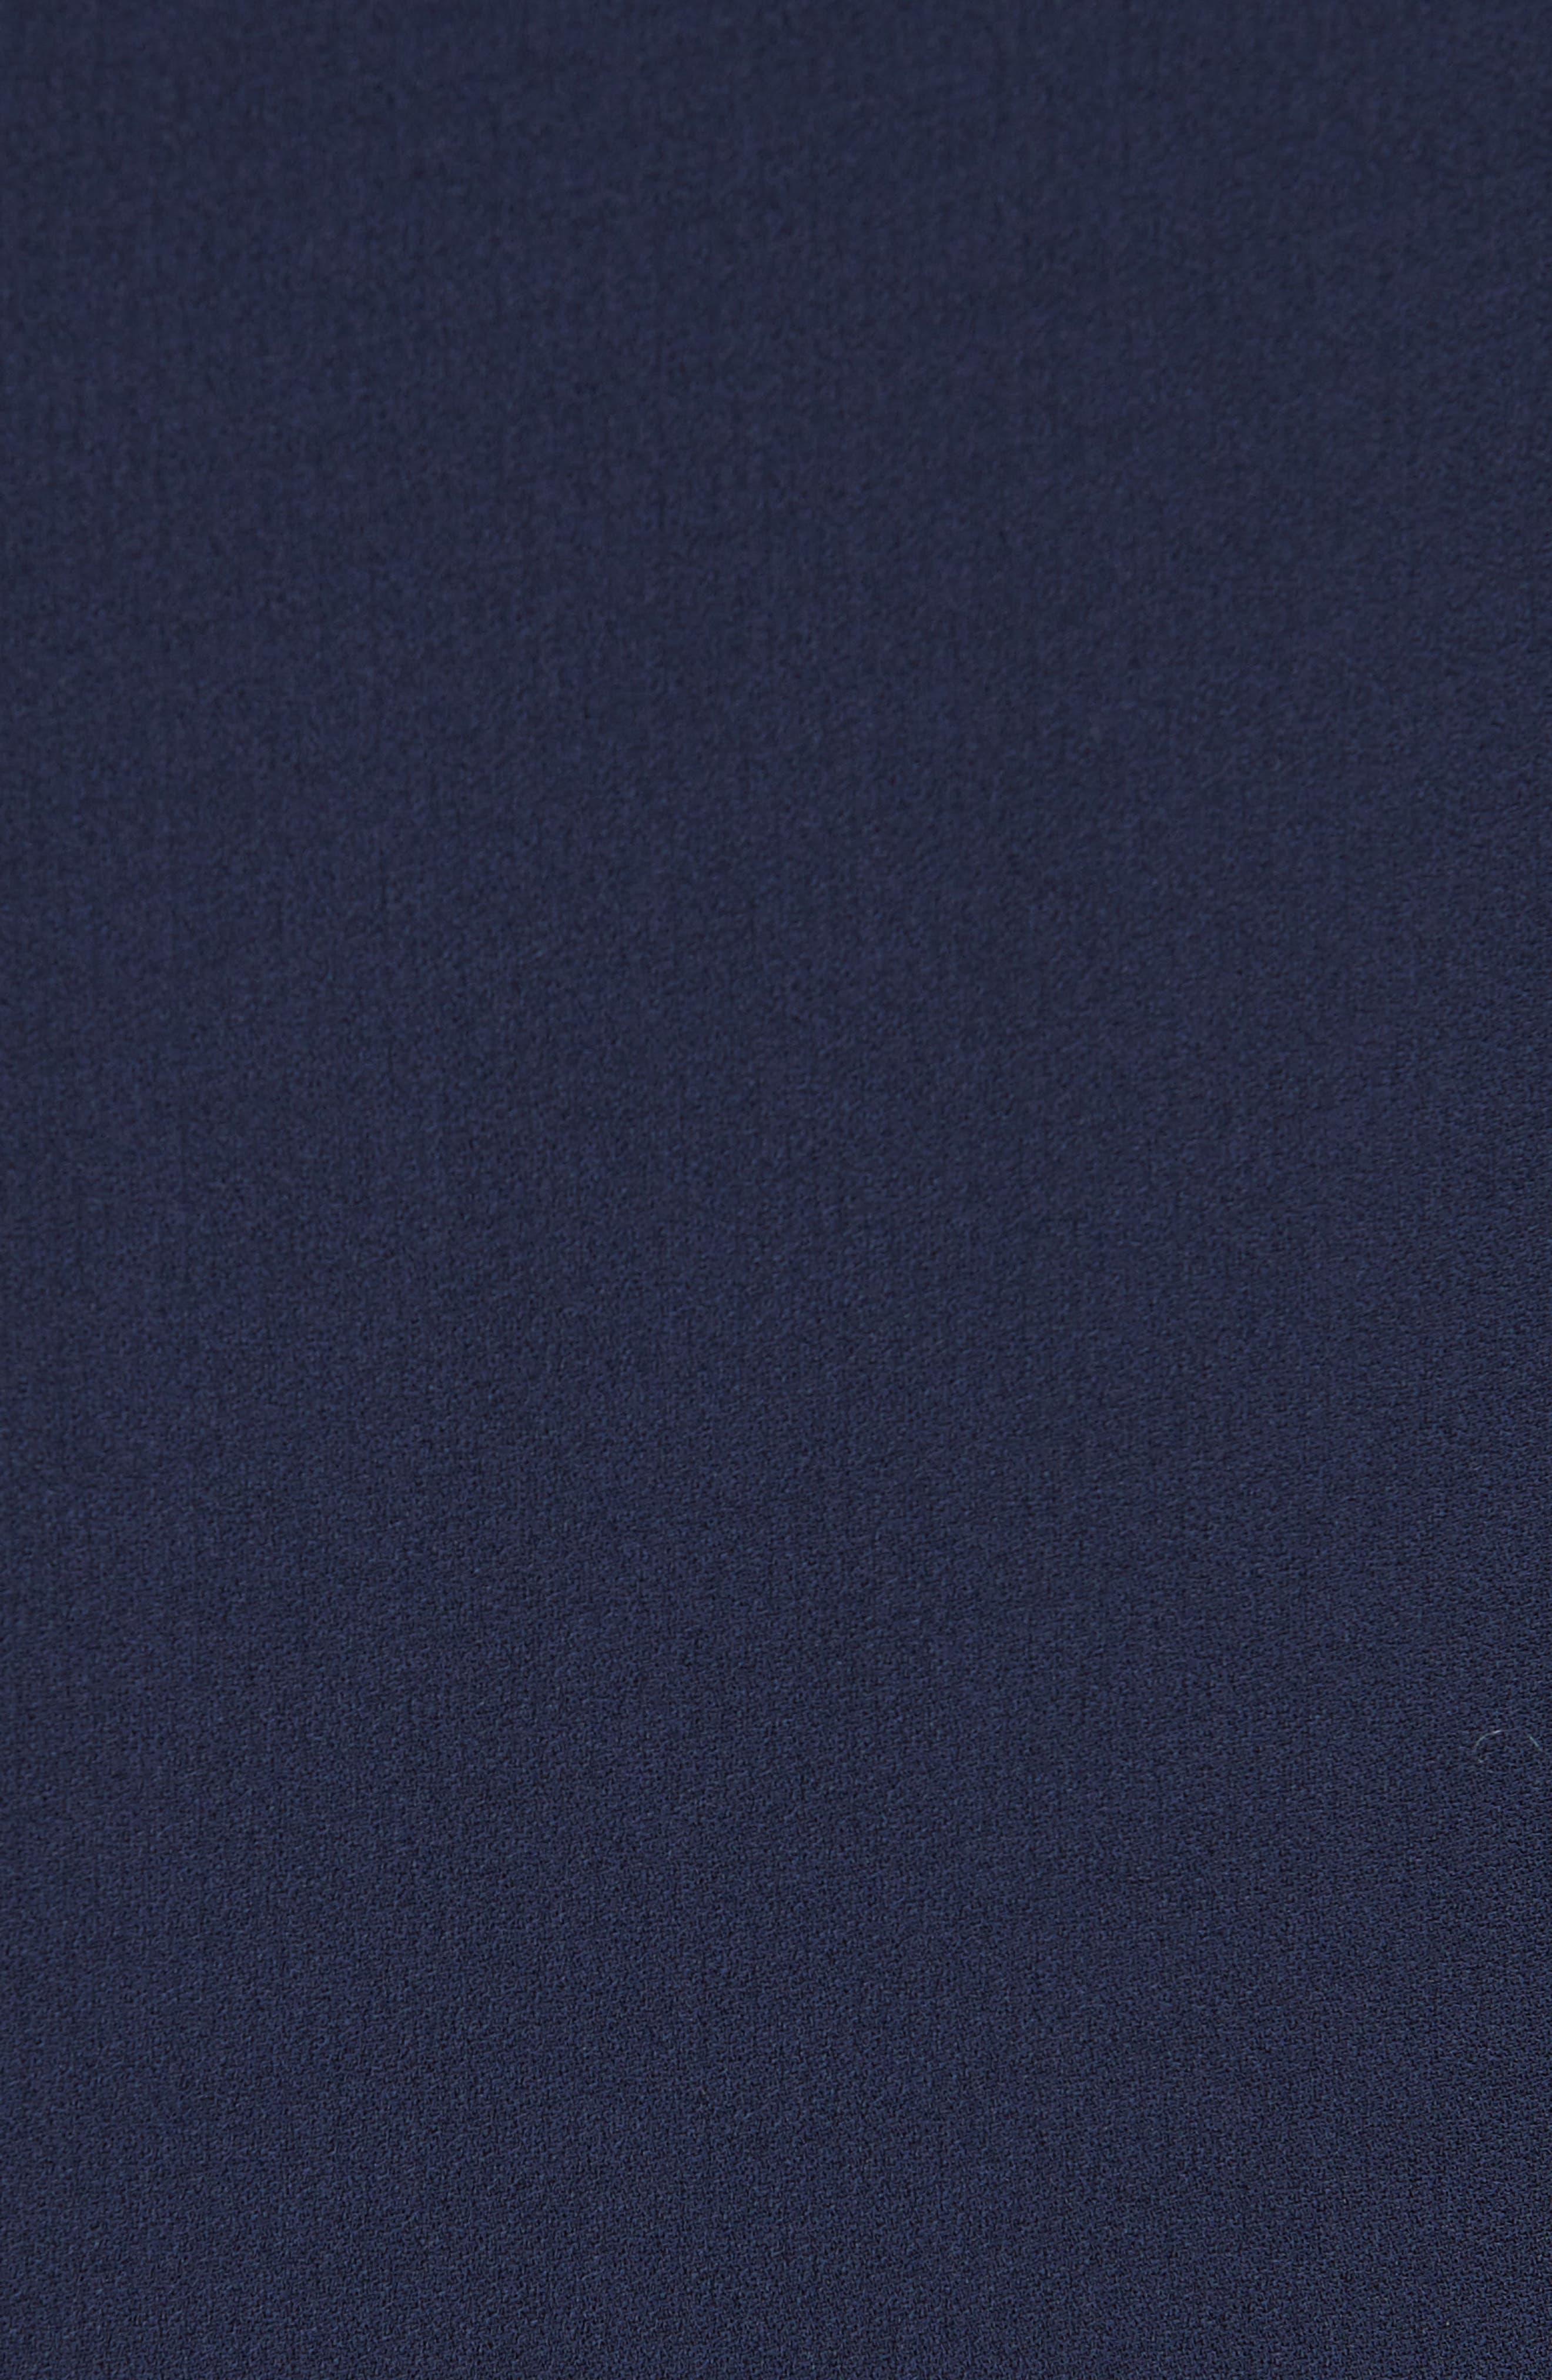 EILEEN FISHER,                             Slit Sleeve Silk Top,                             Alternate thumbnail 5, color,                             MIDNIGHT